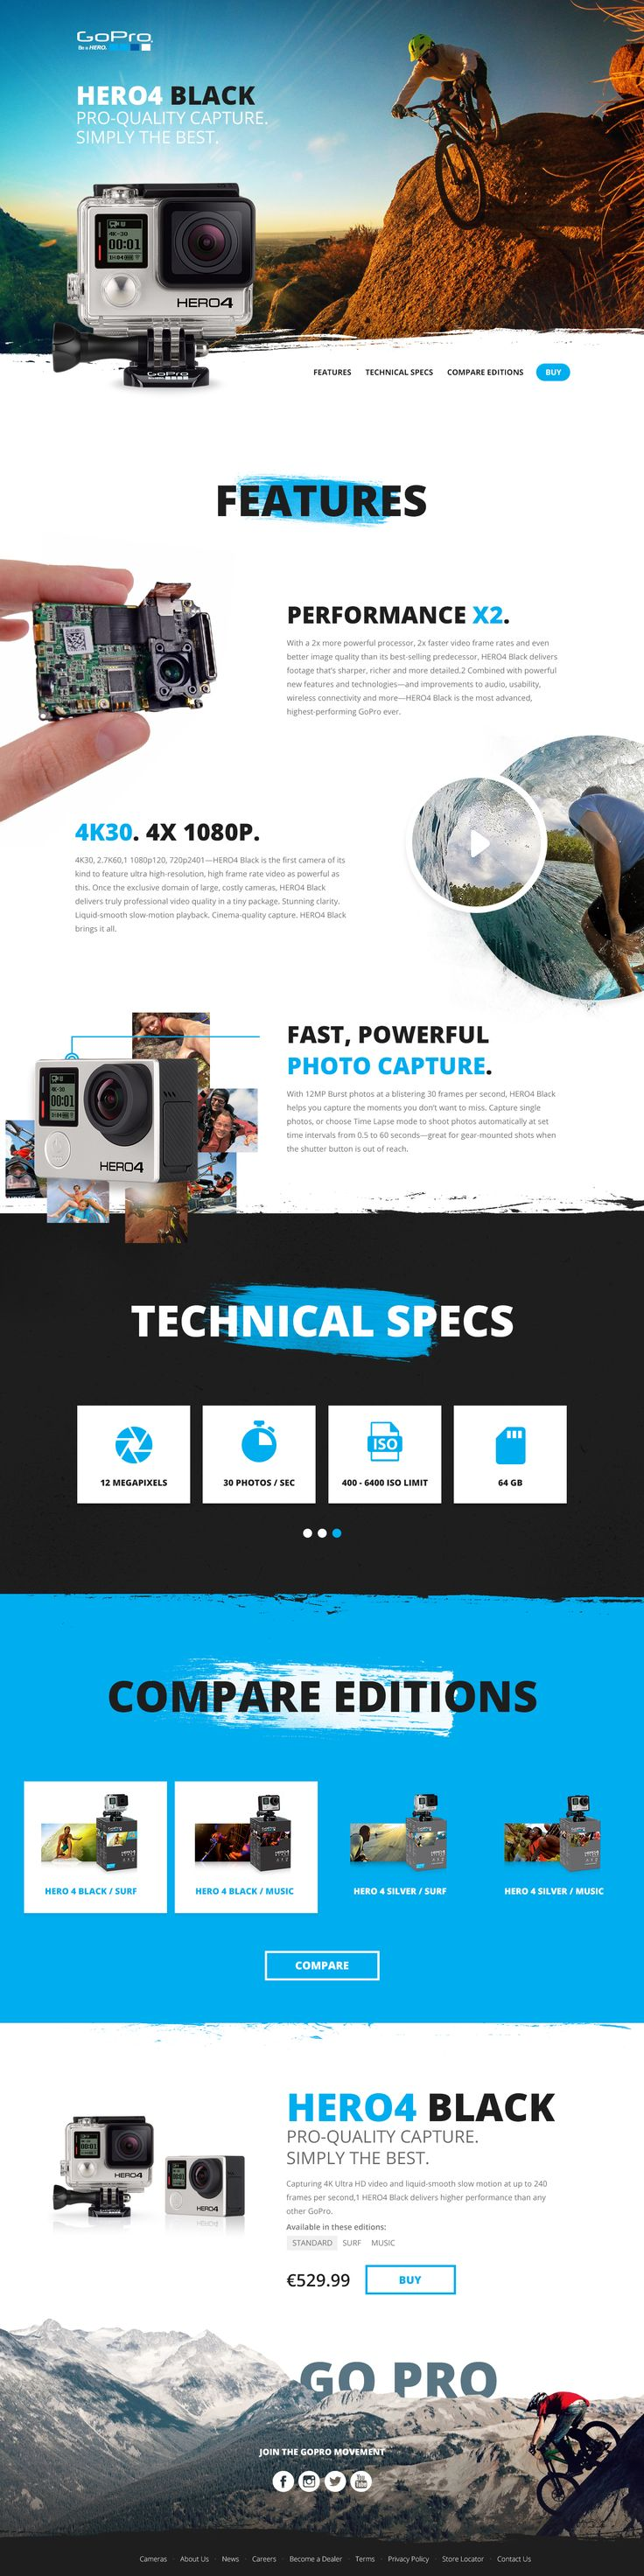 GoPro Redesign by Seeger Mattijs